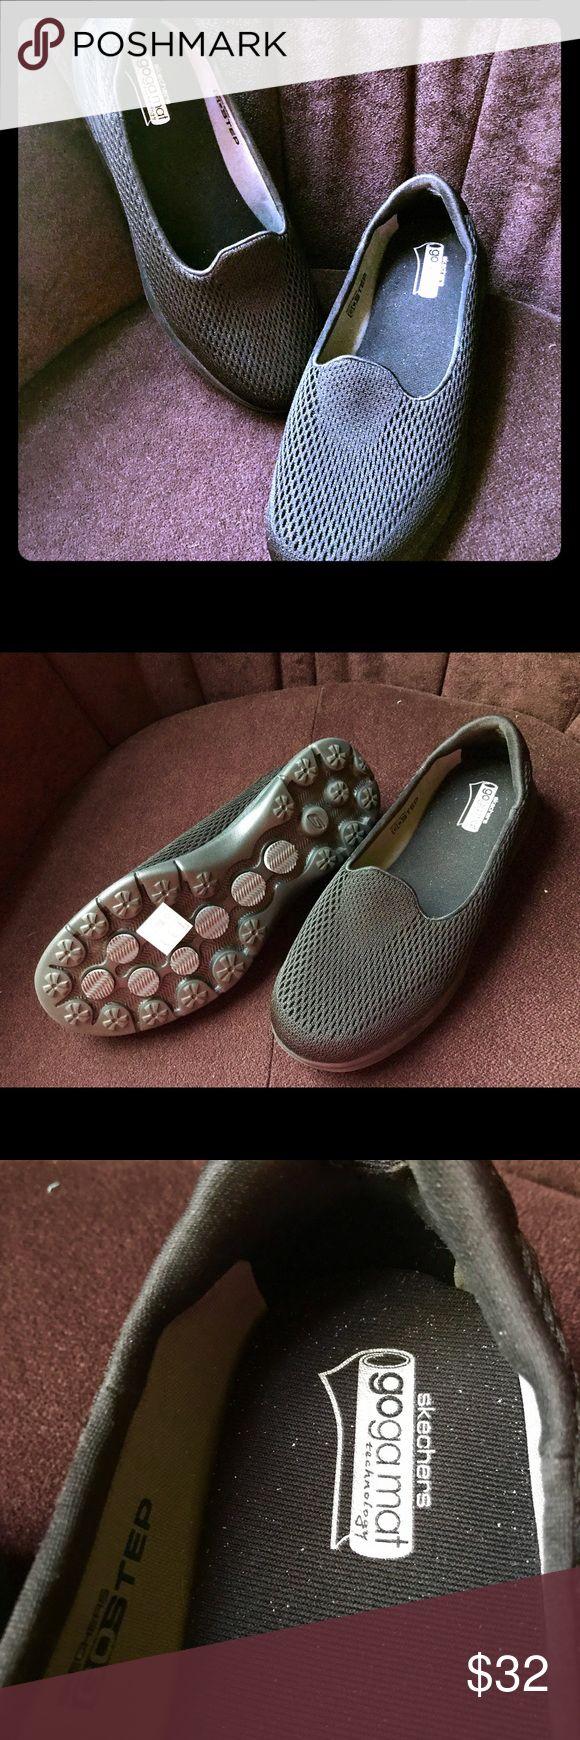 Black Skechers Goga Mat shoes Super comfy black Skechers Goga Mat shoes.  Never worn - NWOT Skechers Shoes Sneakers